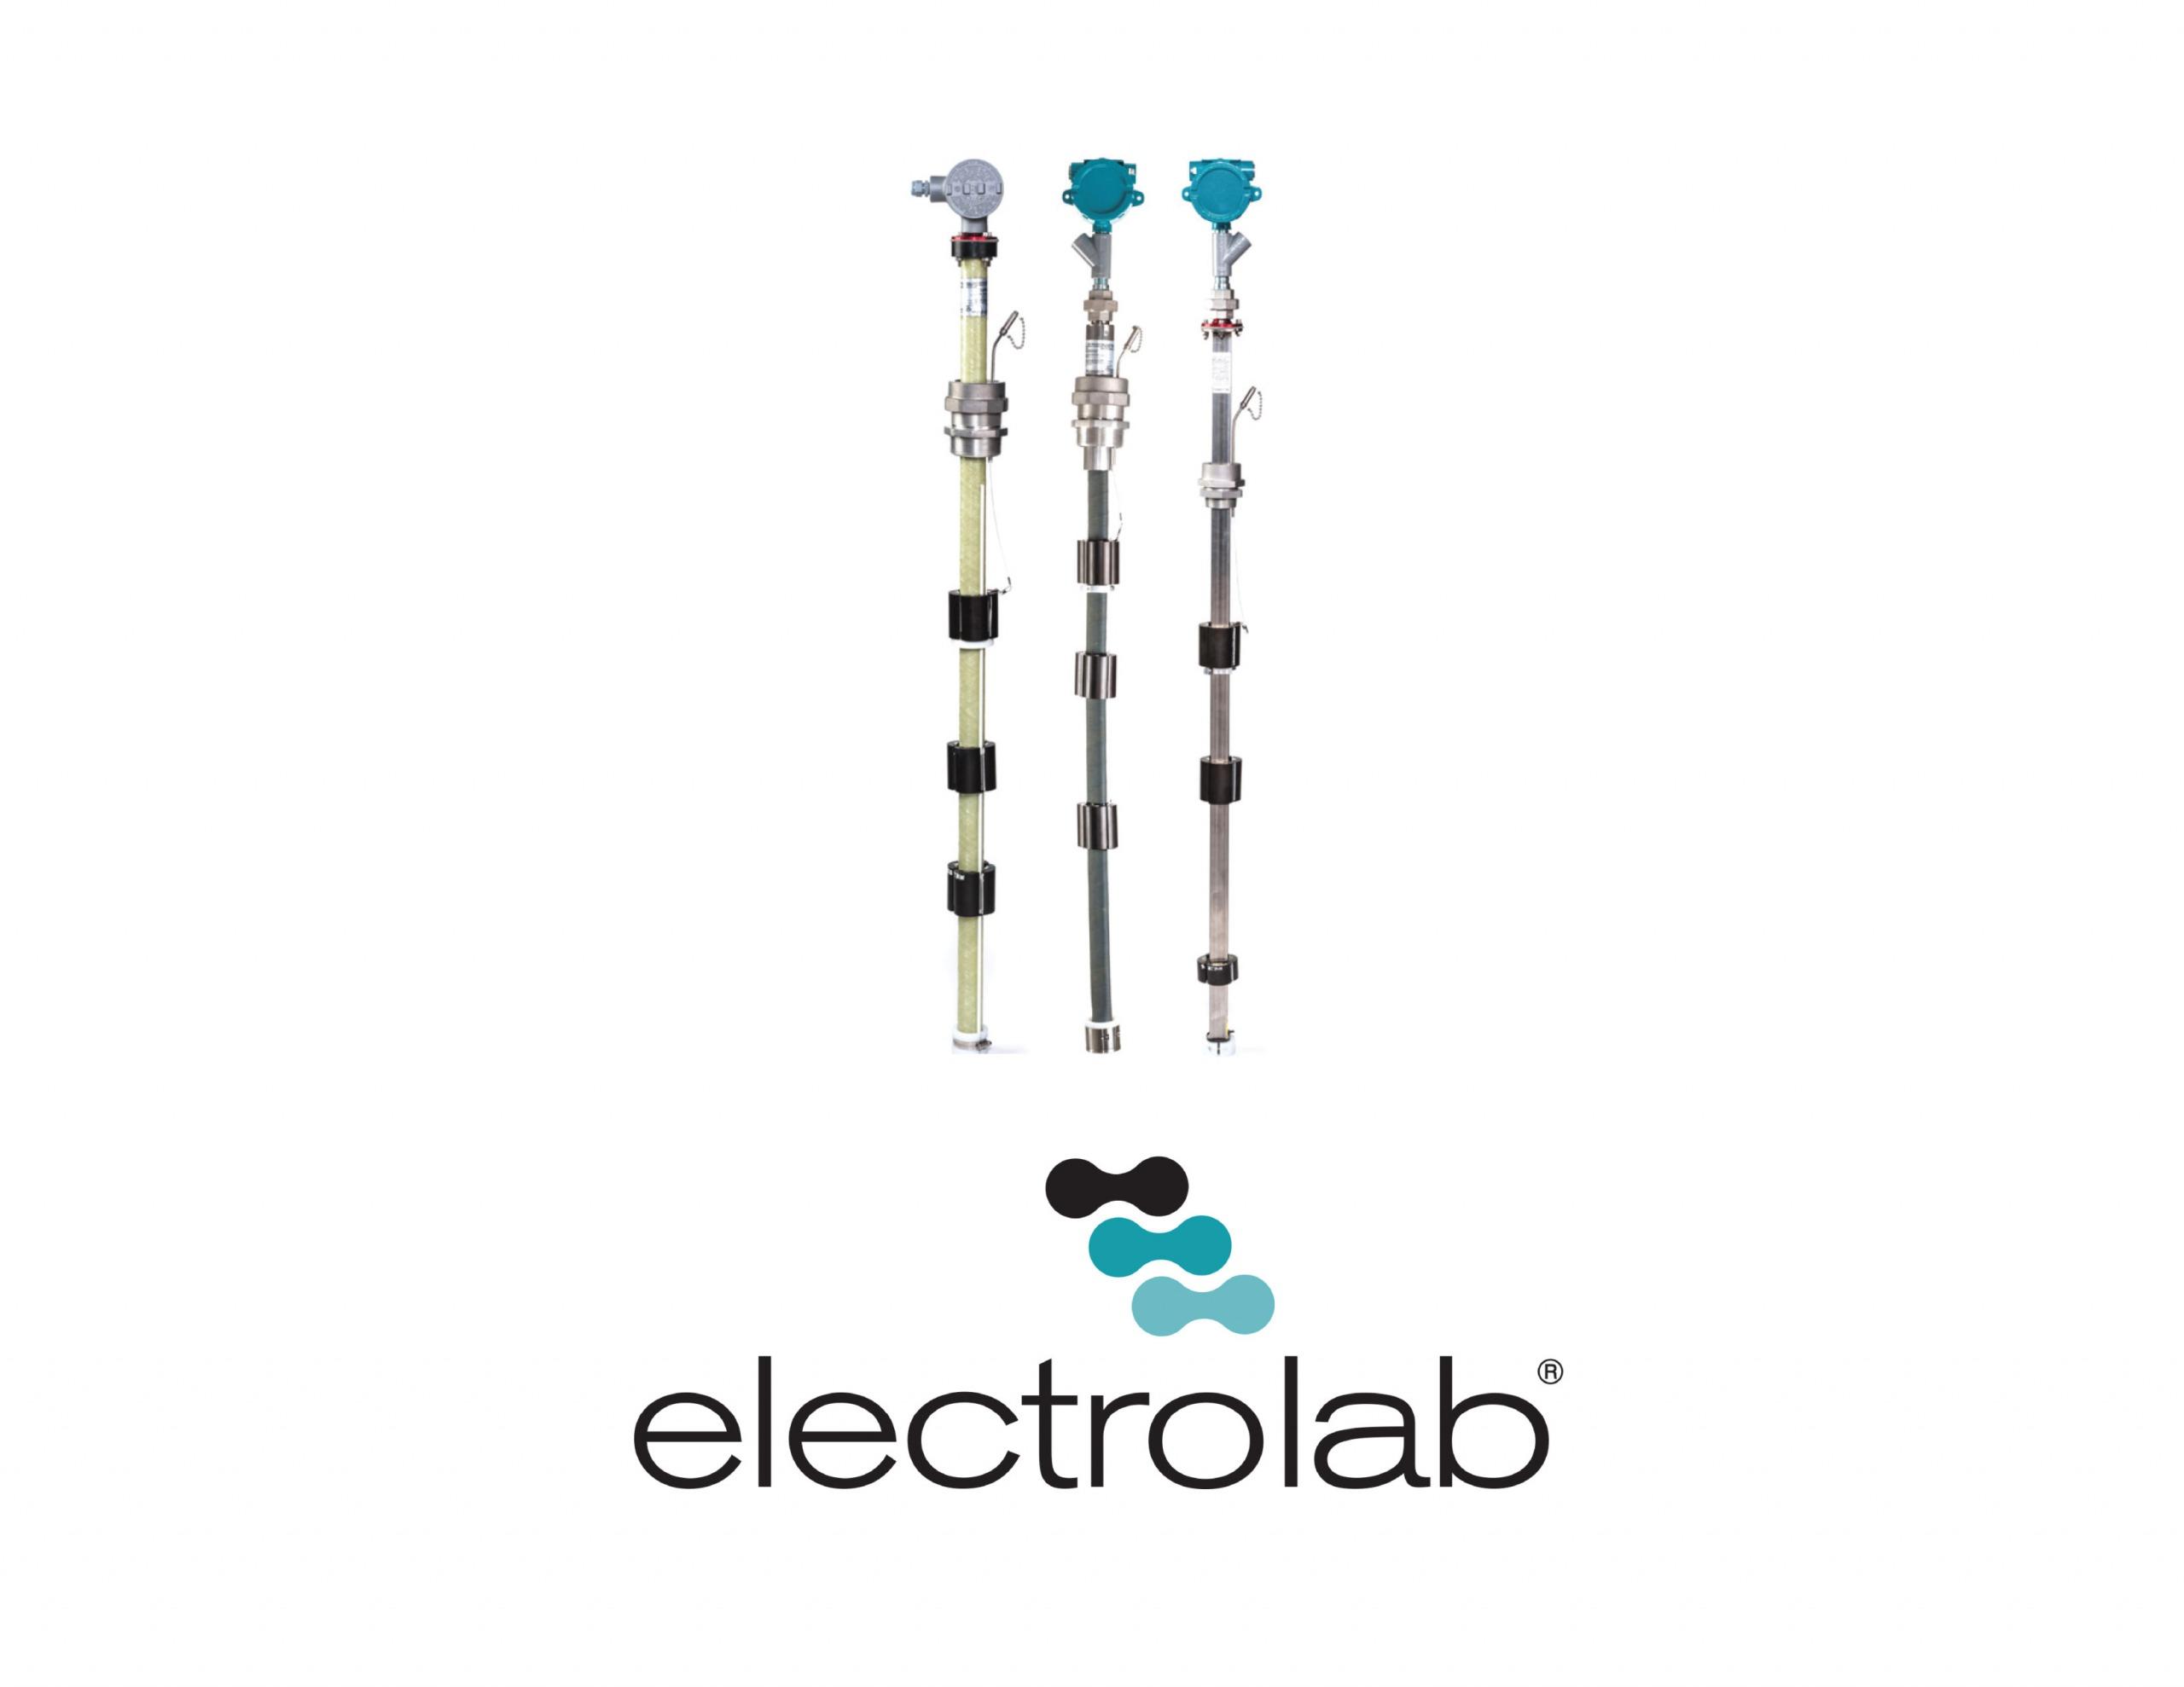 Electrolab